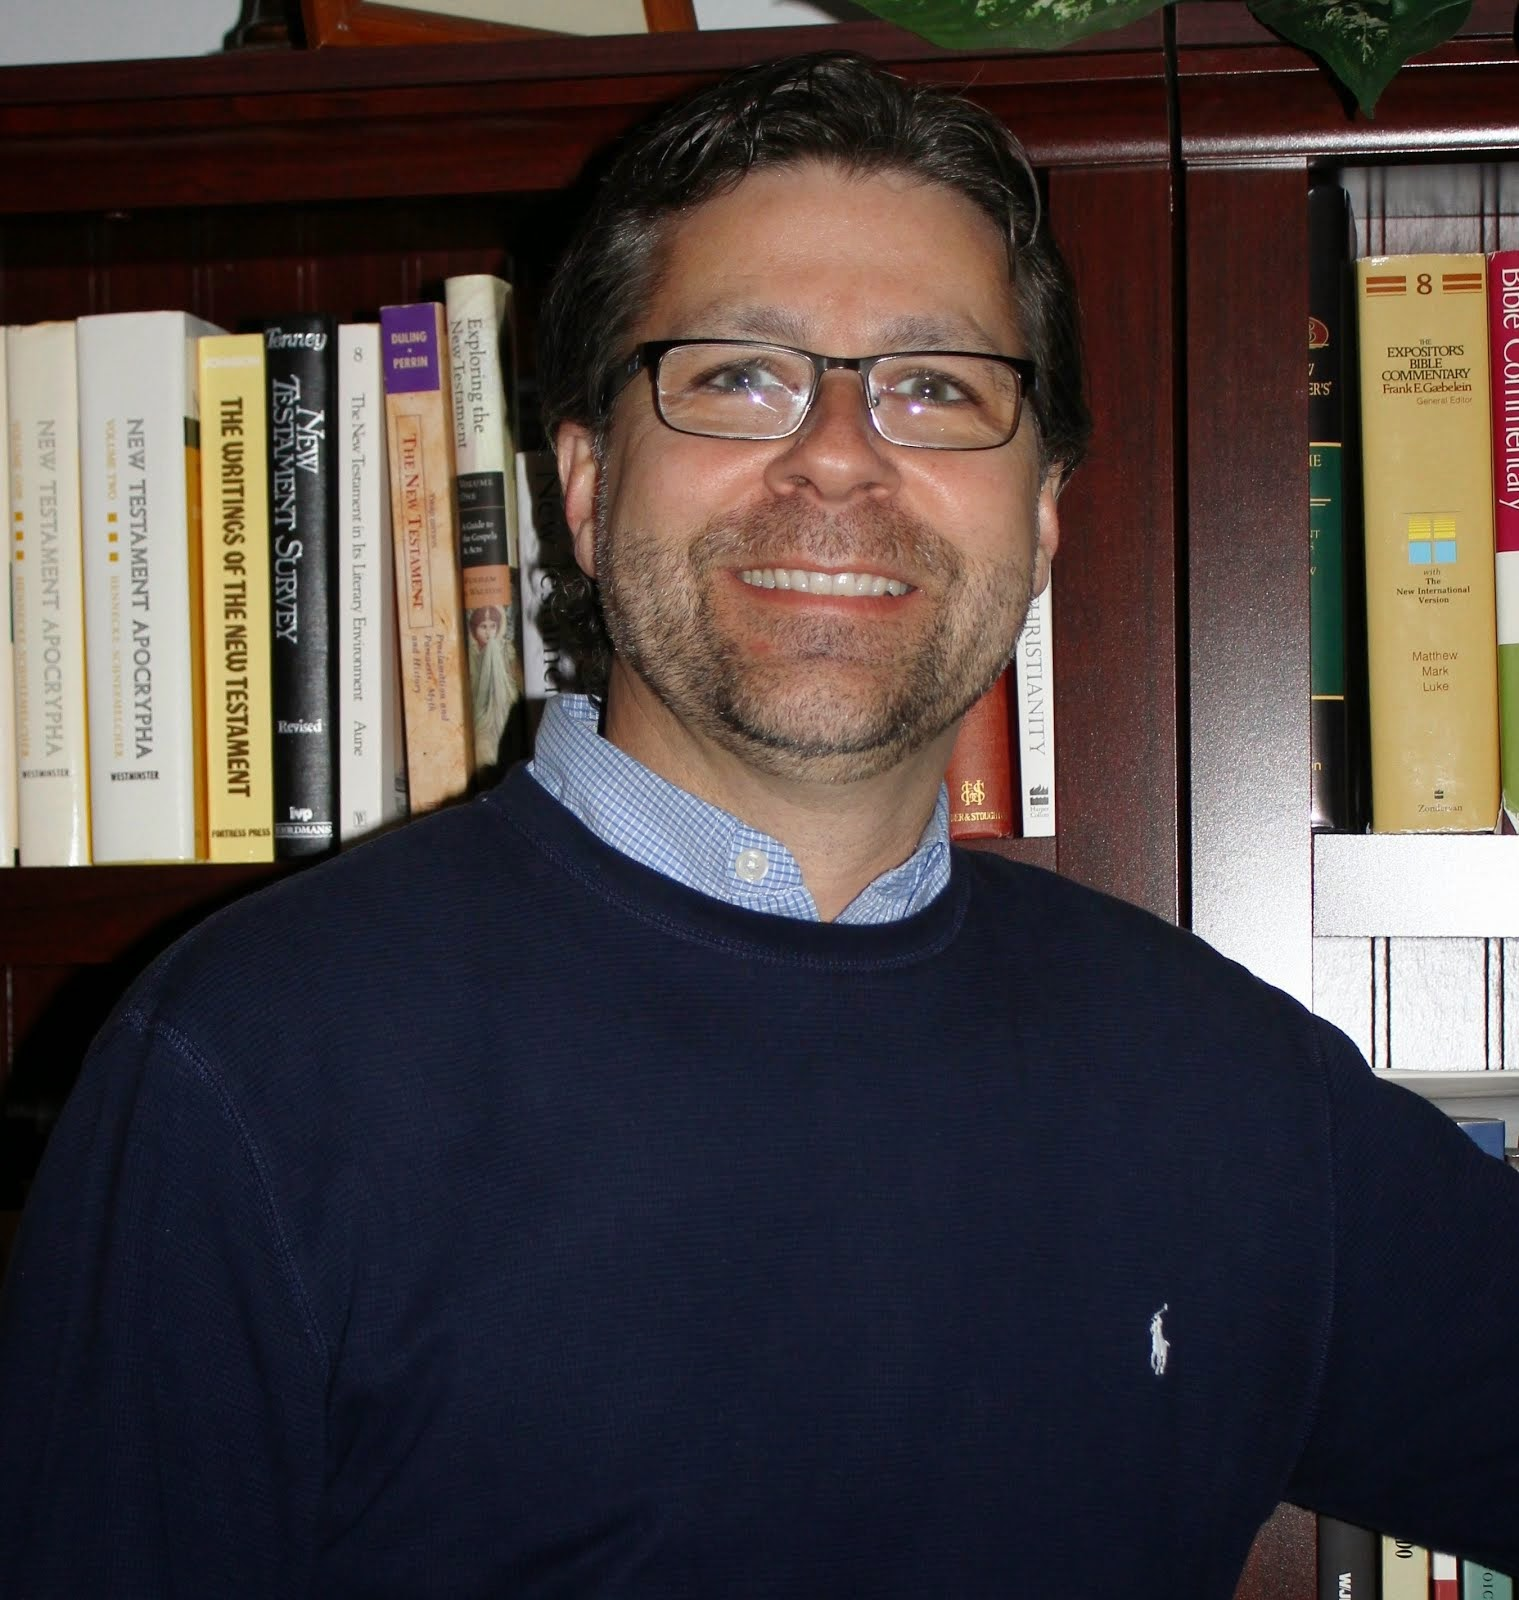 C. Drew Smith